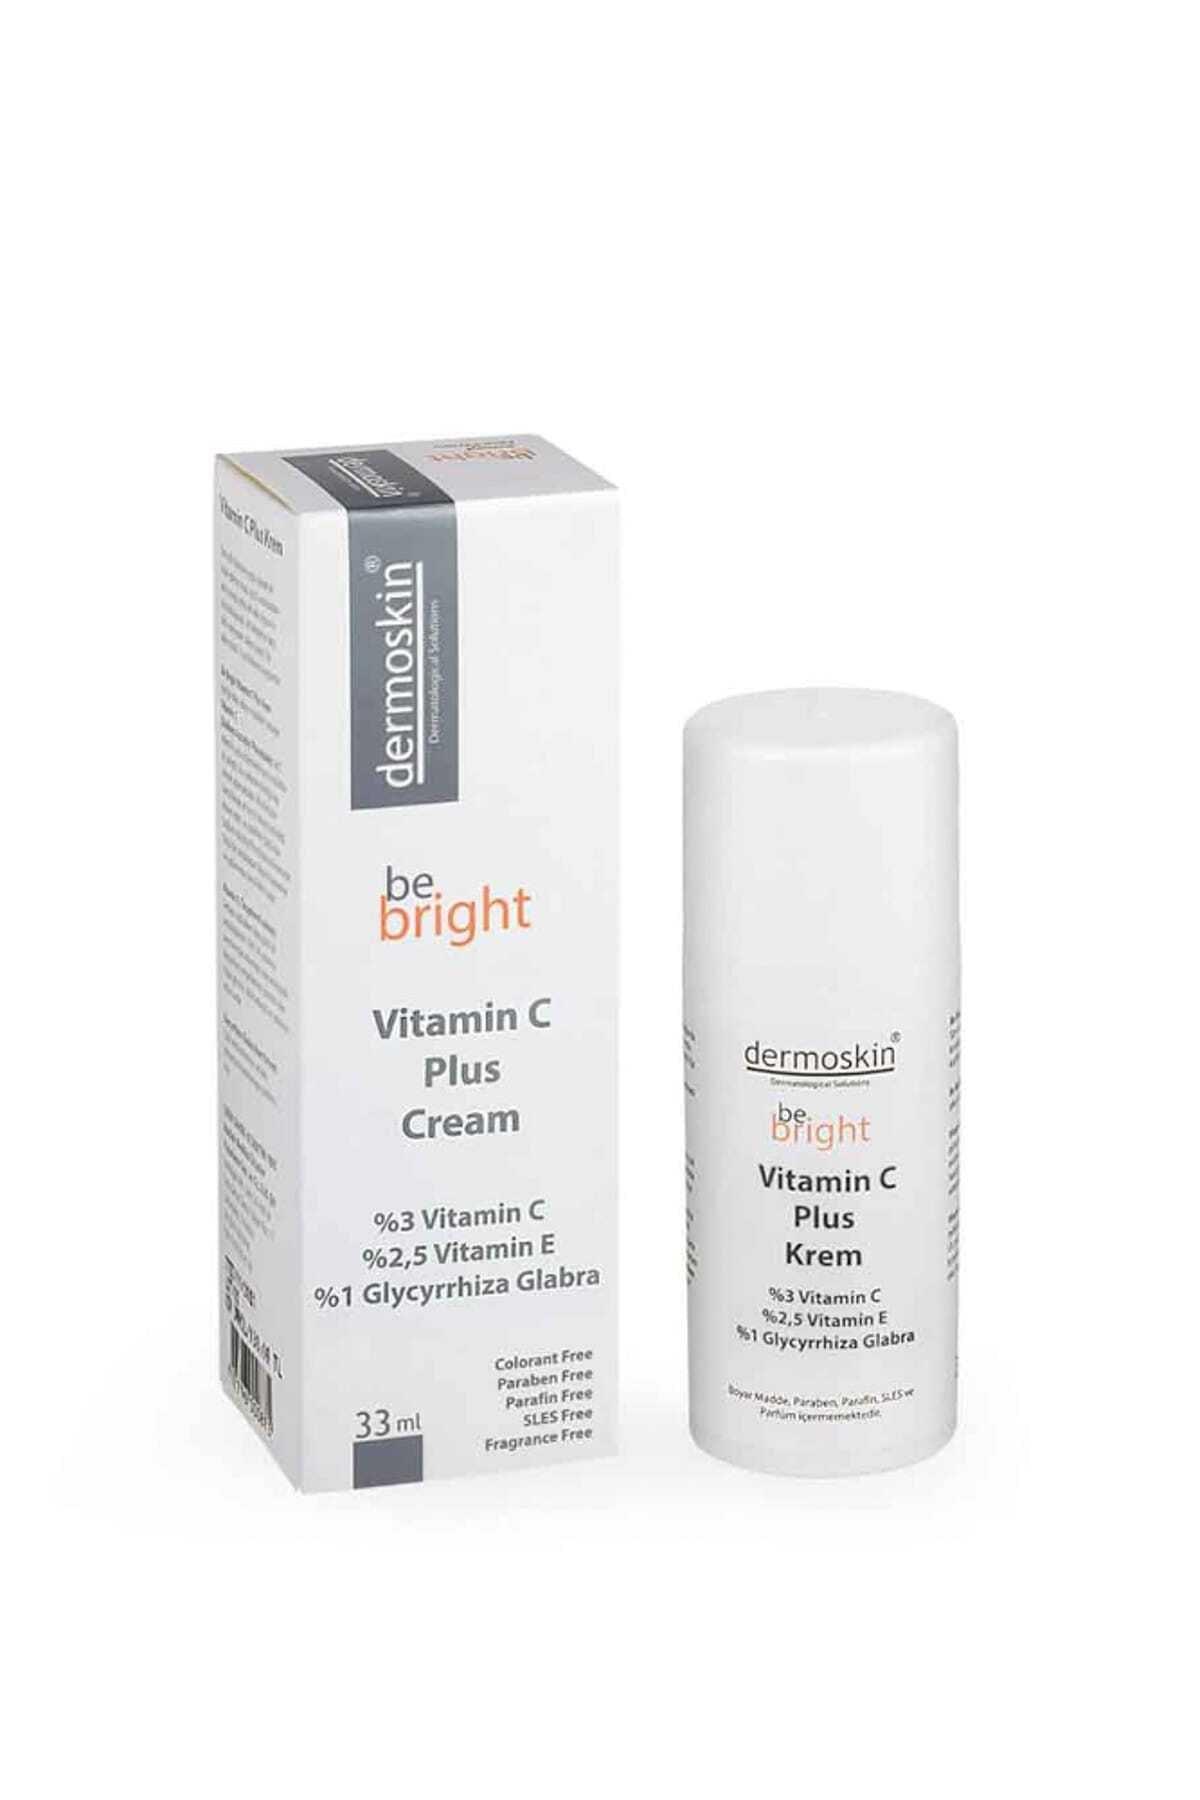 Dermoskin Be Bright Vitamin C Plus Krem 33 Ml 8697796000875 1